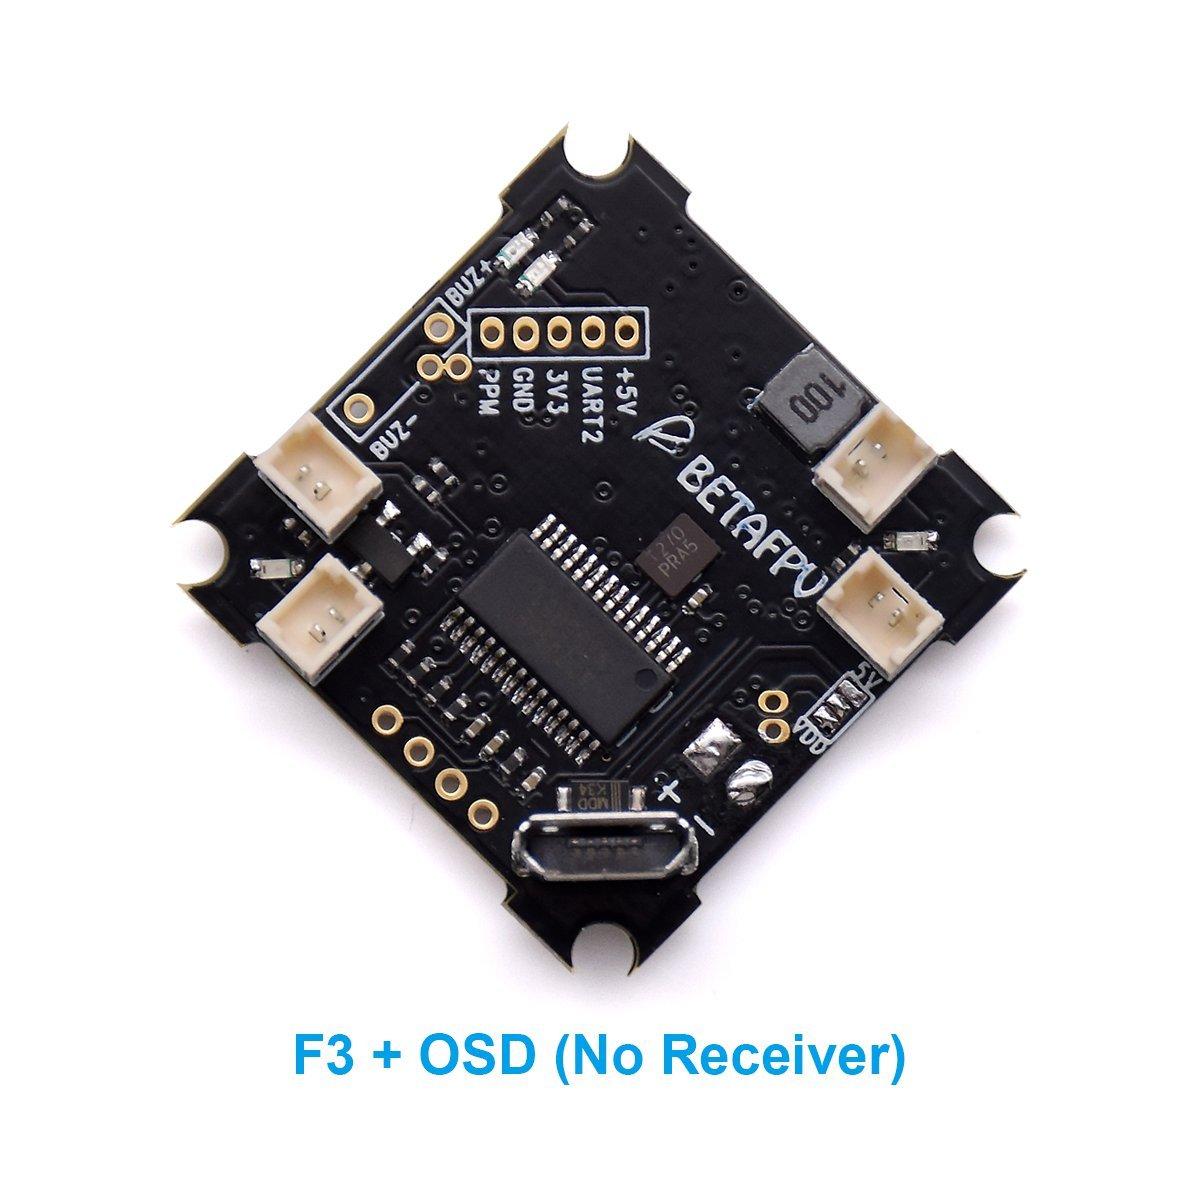 BETAFPV F3 Whoop Flight Controller with Betaflight OSD (NO Receiver Version)<br>